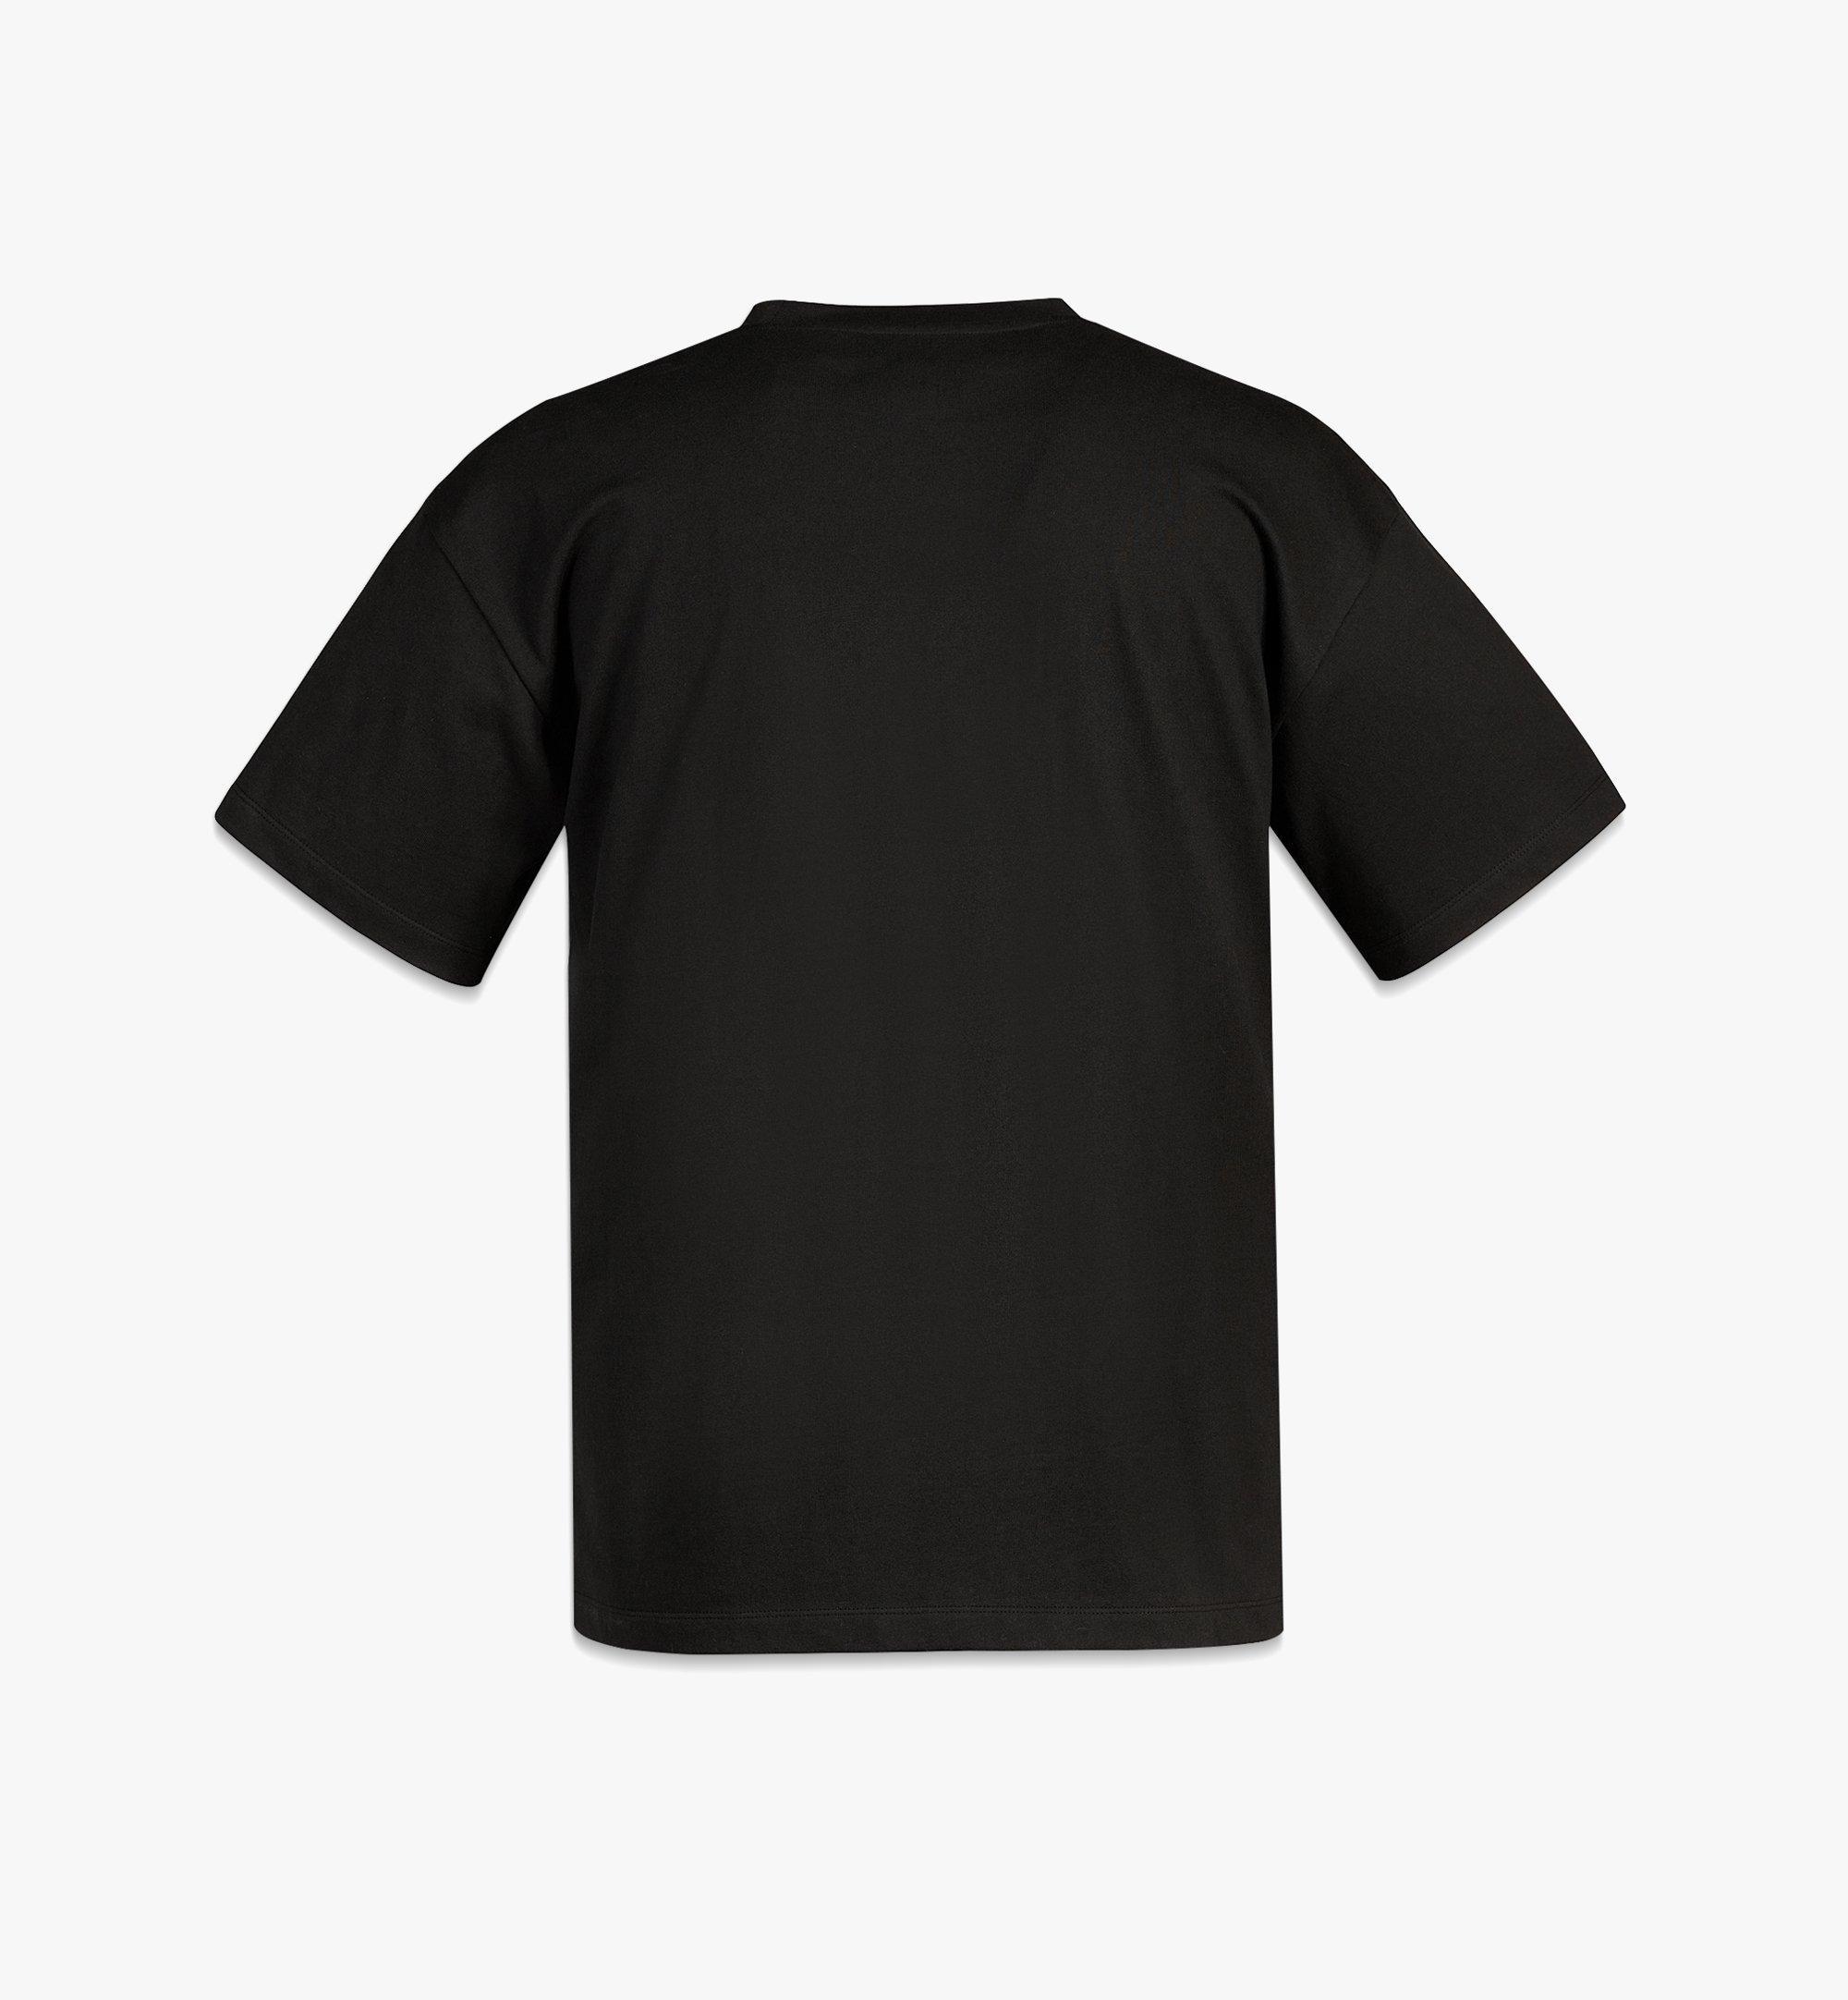 MCM MCM x SAMBYPEN Logo Print T-Shirt Black MHTBASP02BK00M Alternate View 1